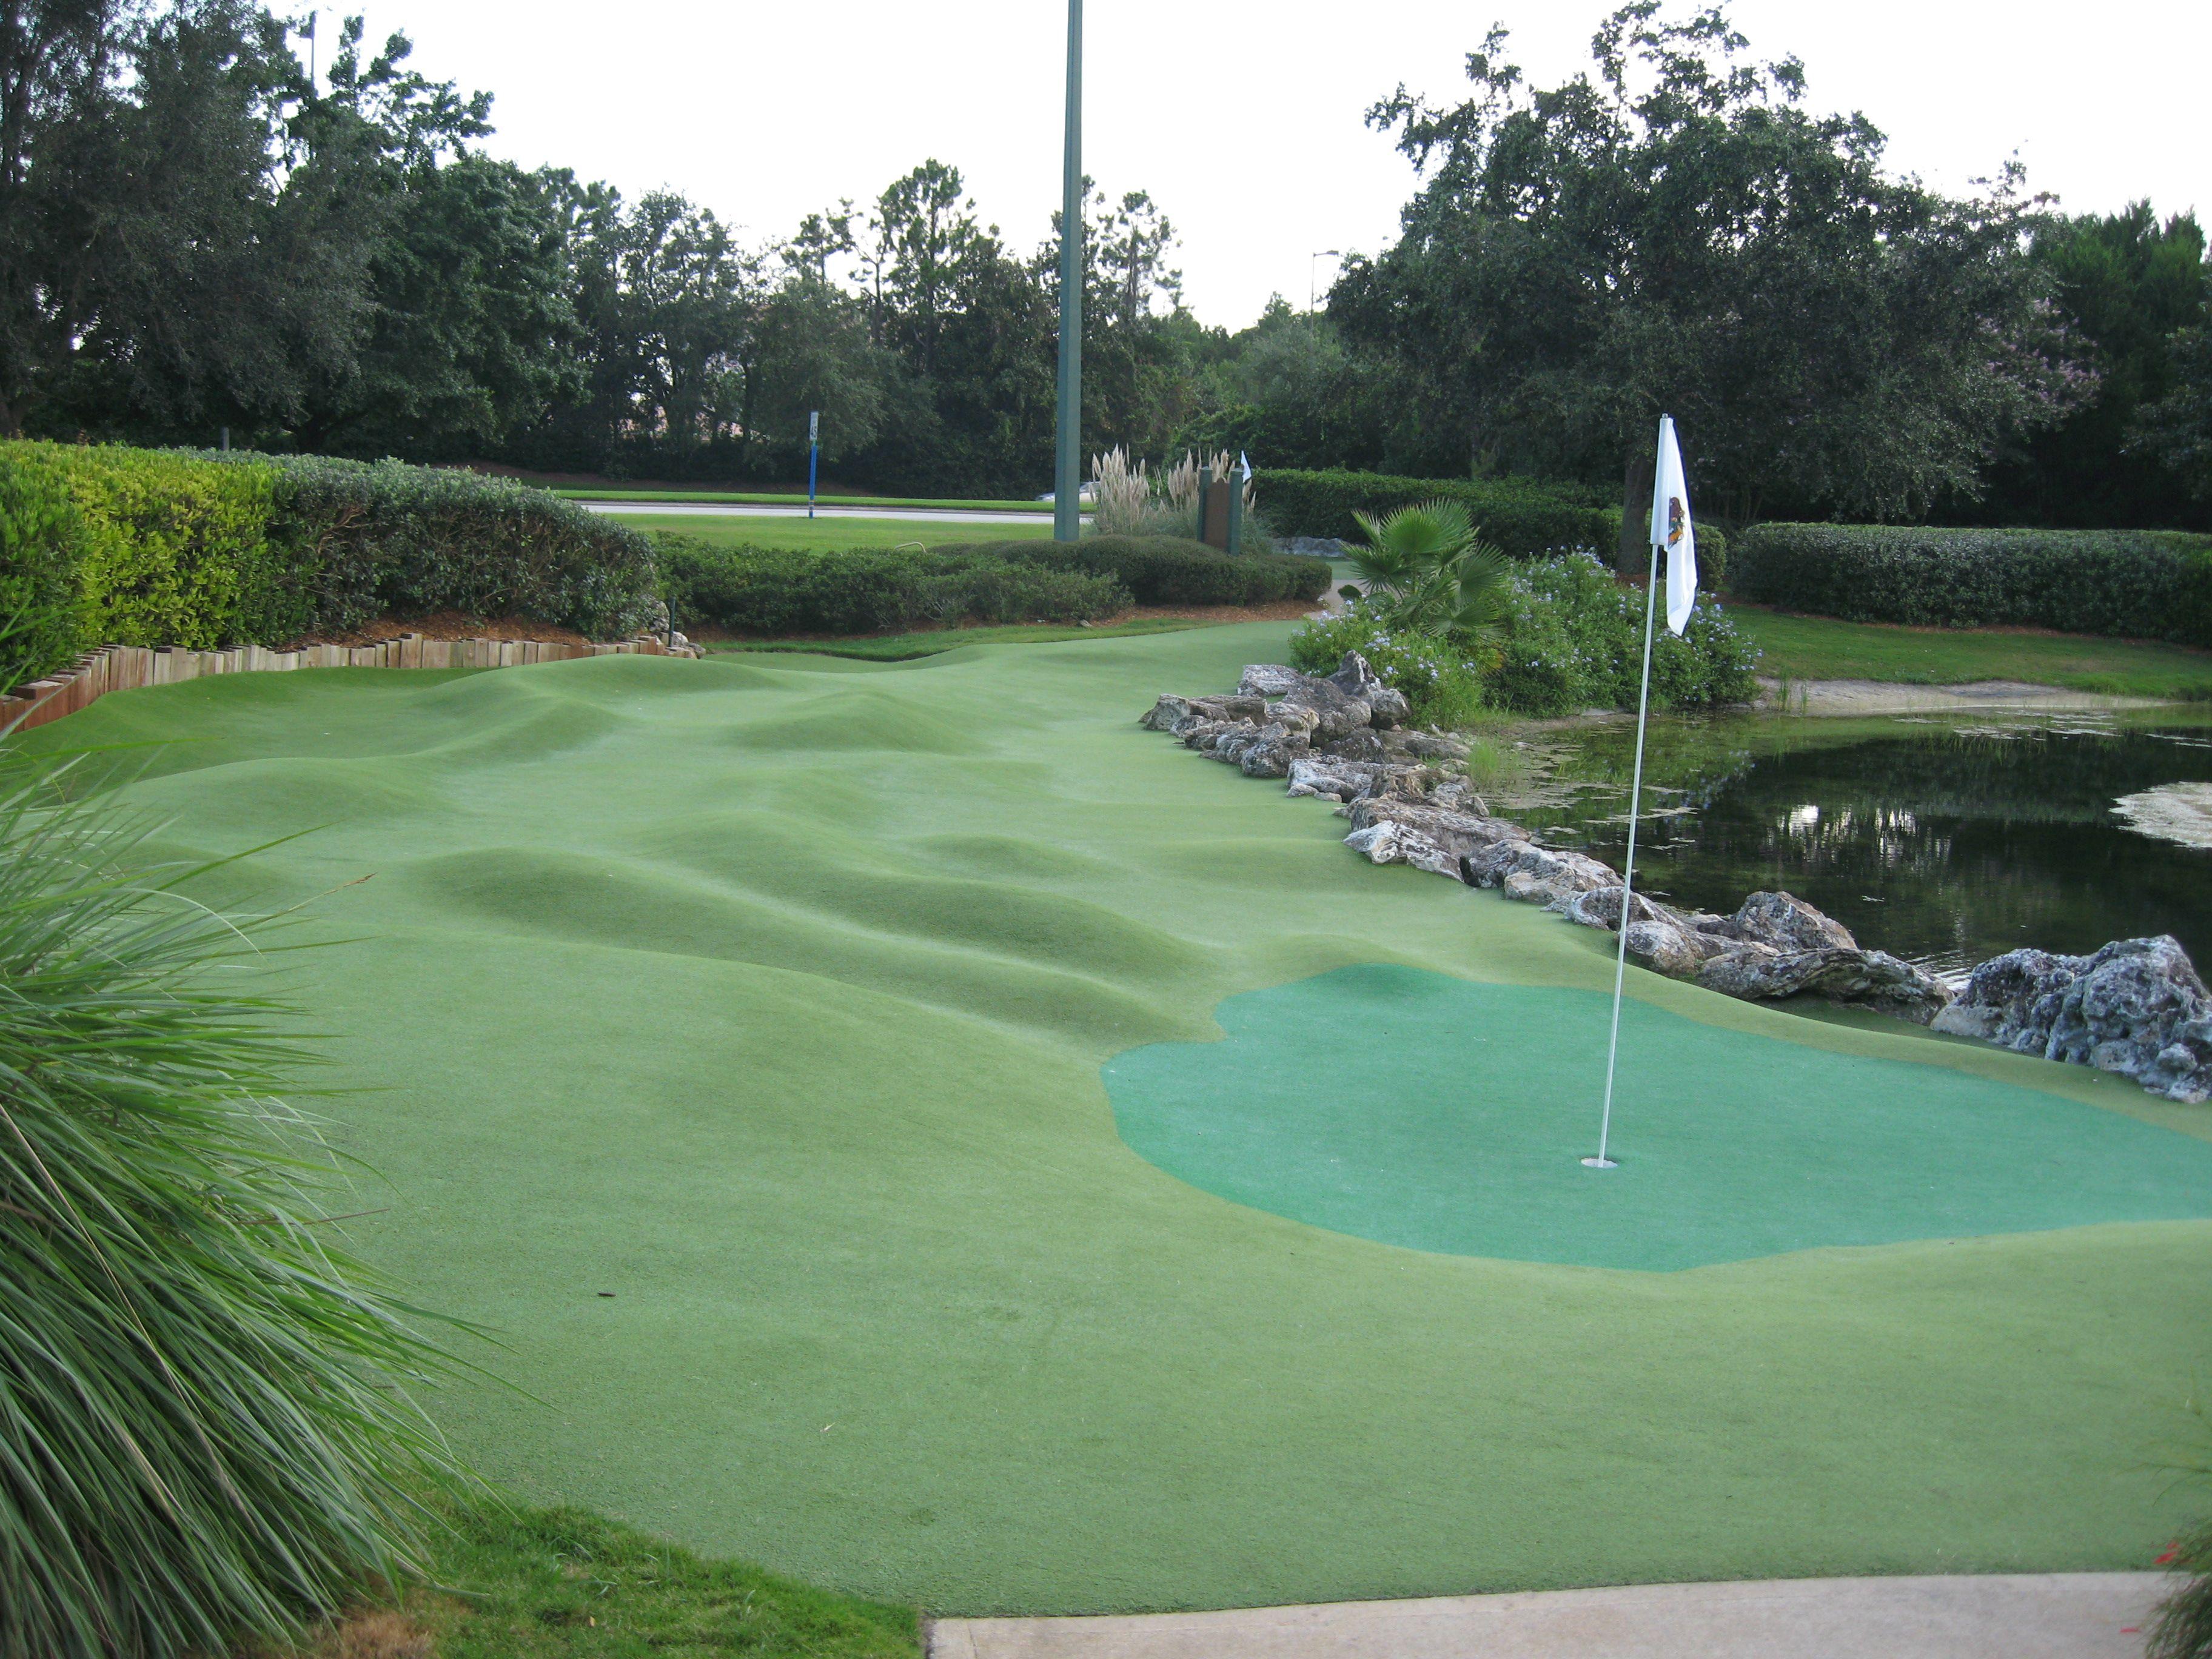 fantasia gardens miniature golf fairways course the longest mini golf course in the us